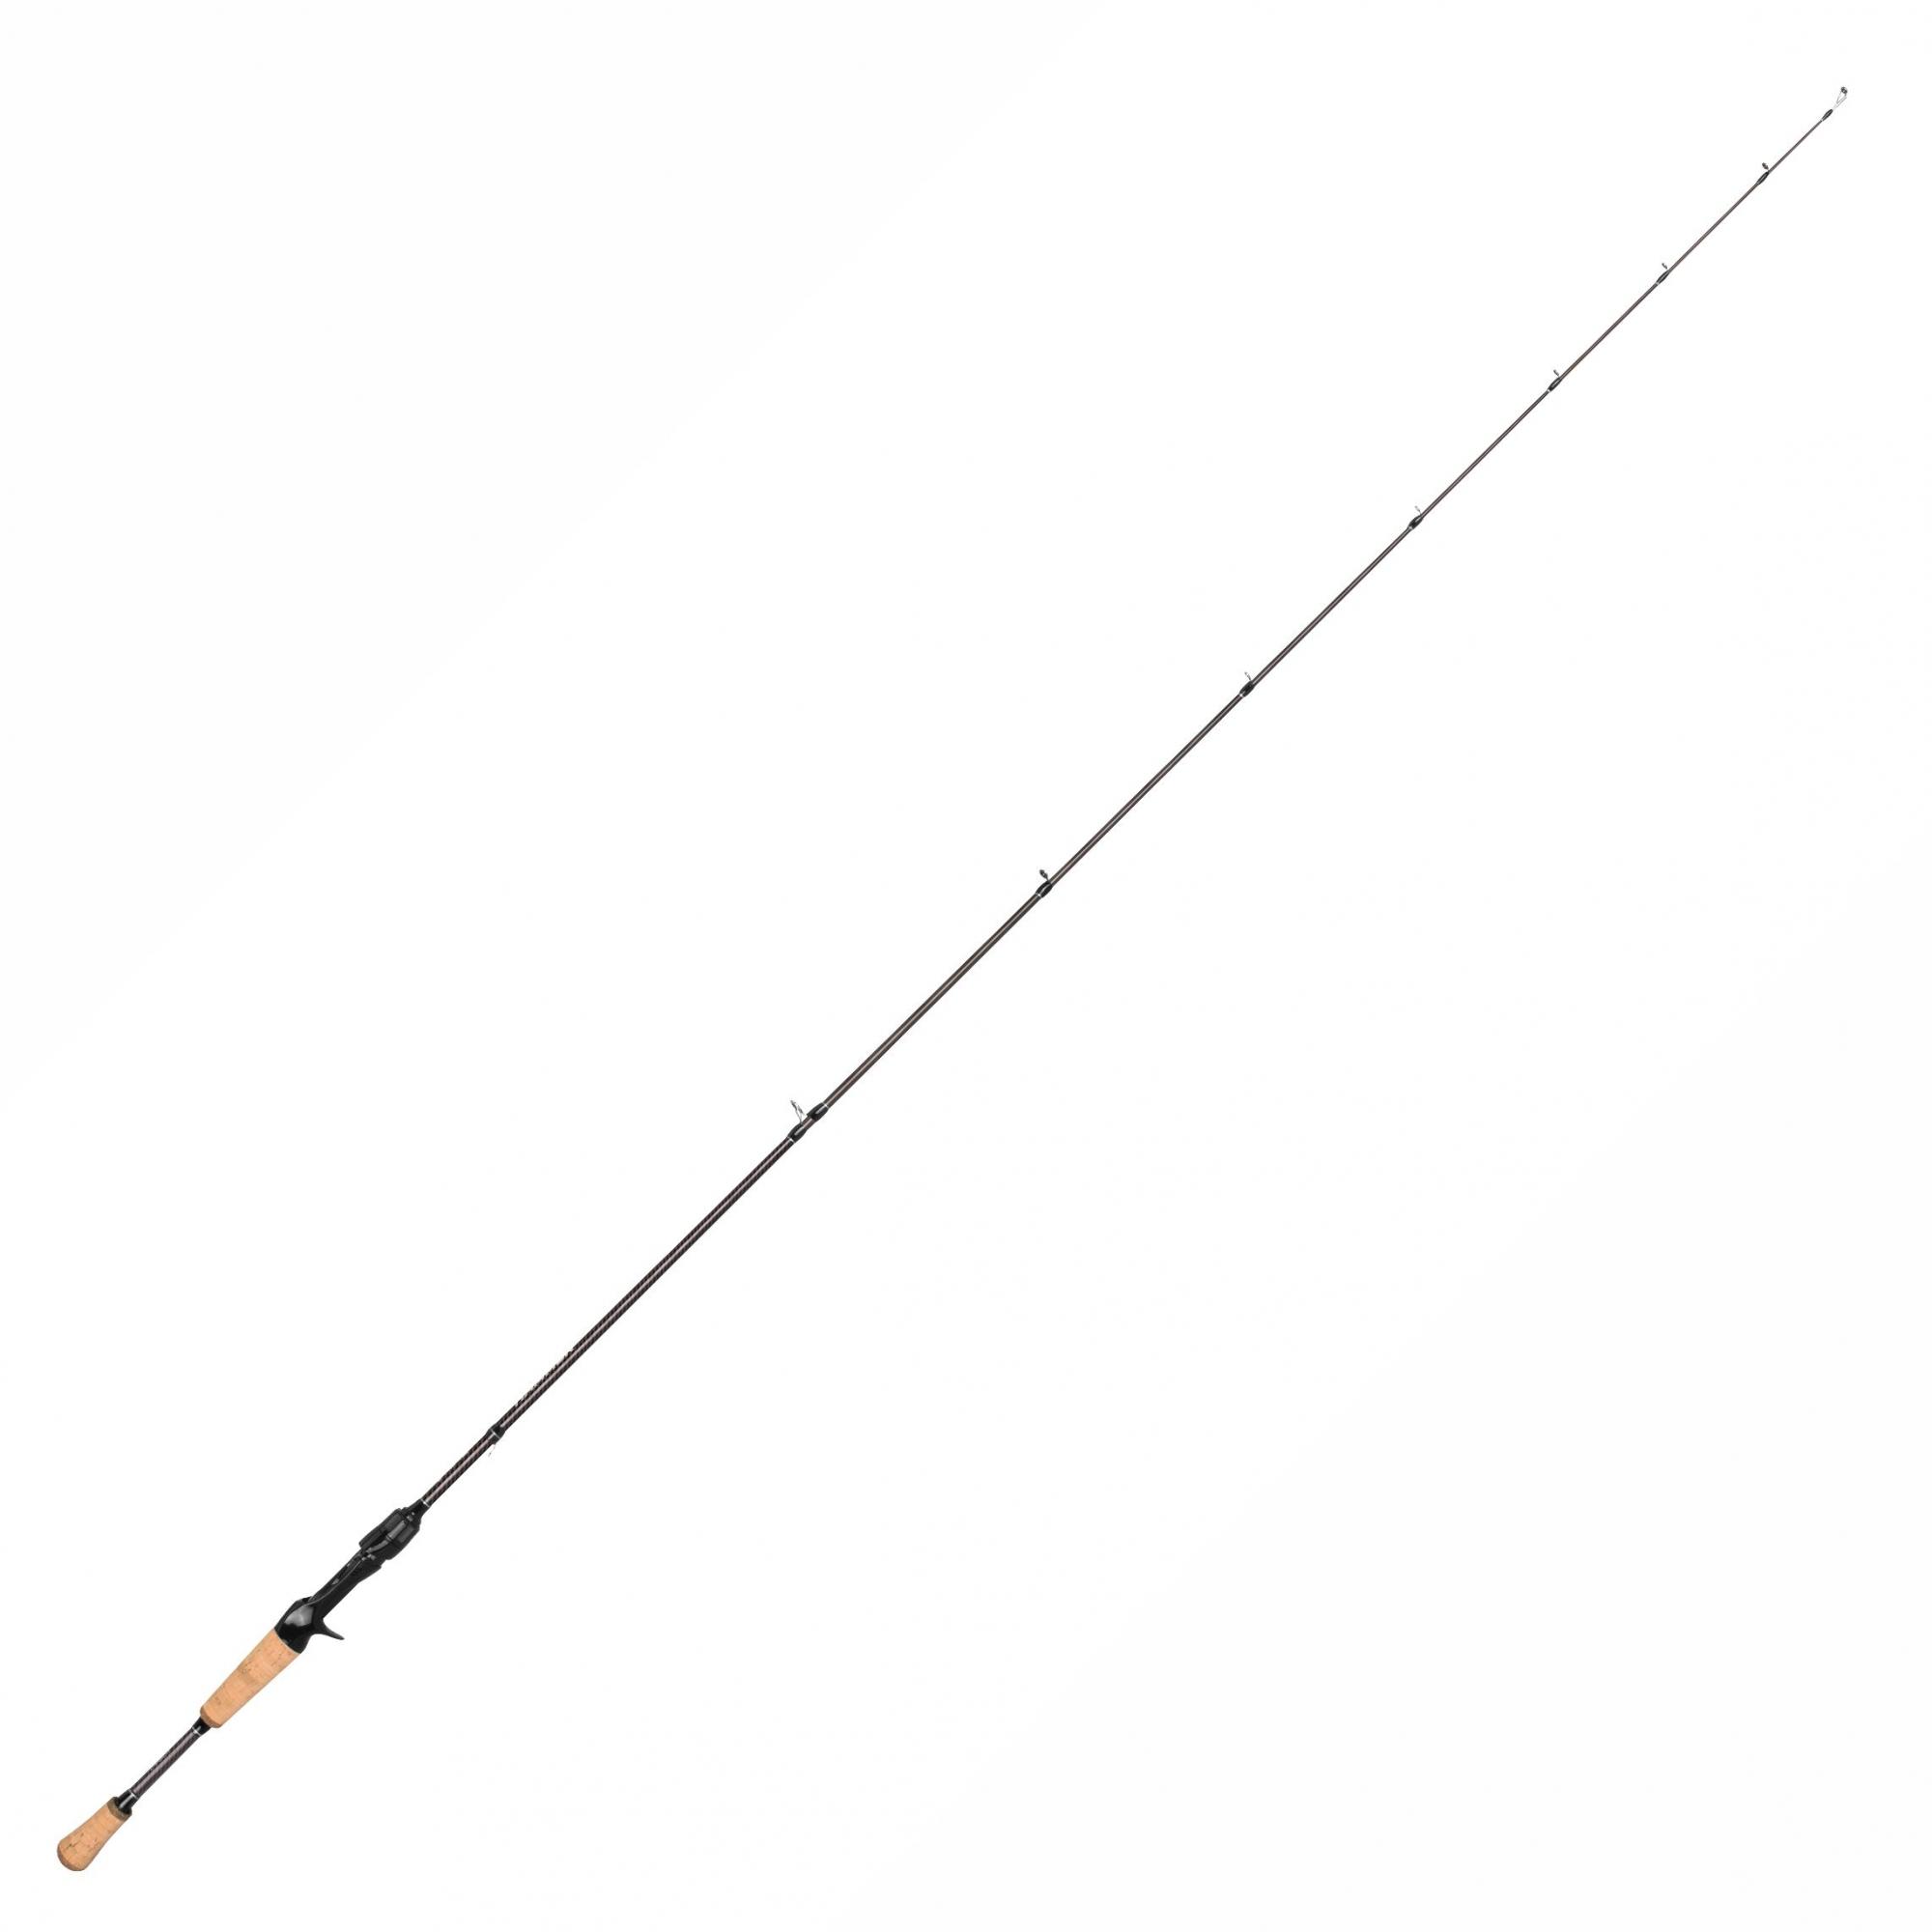 Vara Saint Hammer 581 1,73m 6-14LB p/ Carretilha   - Pesca Adventure